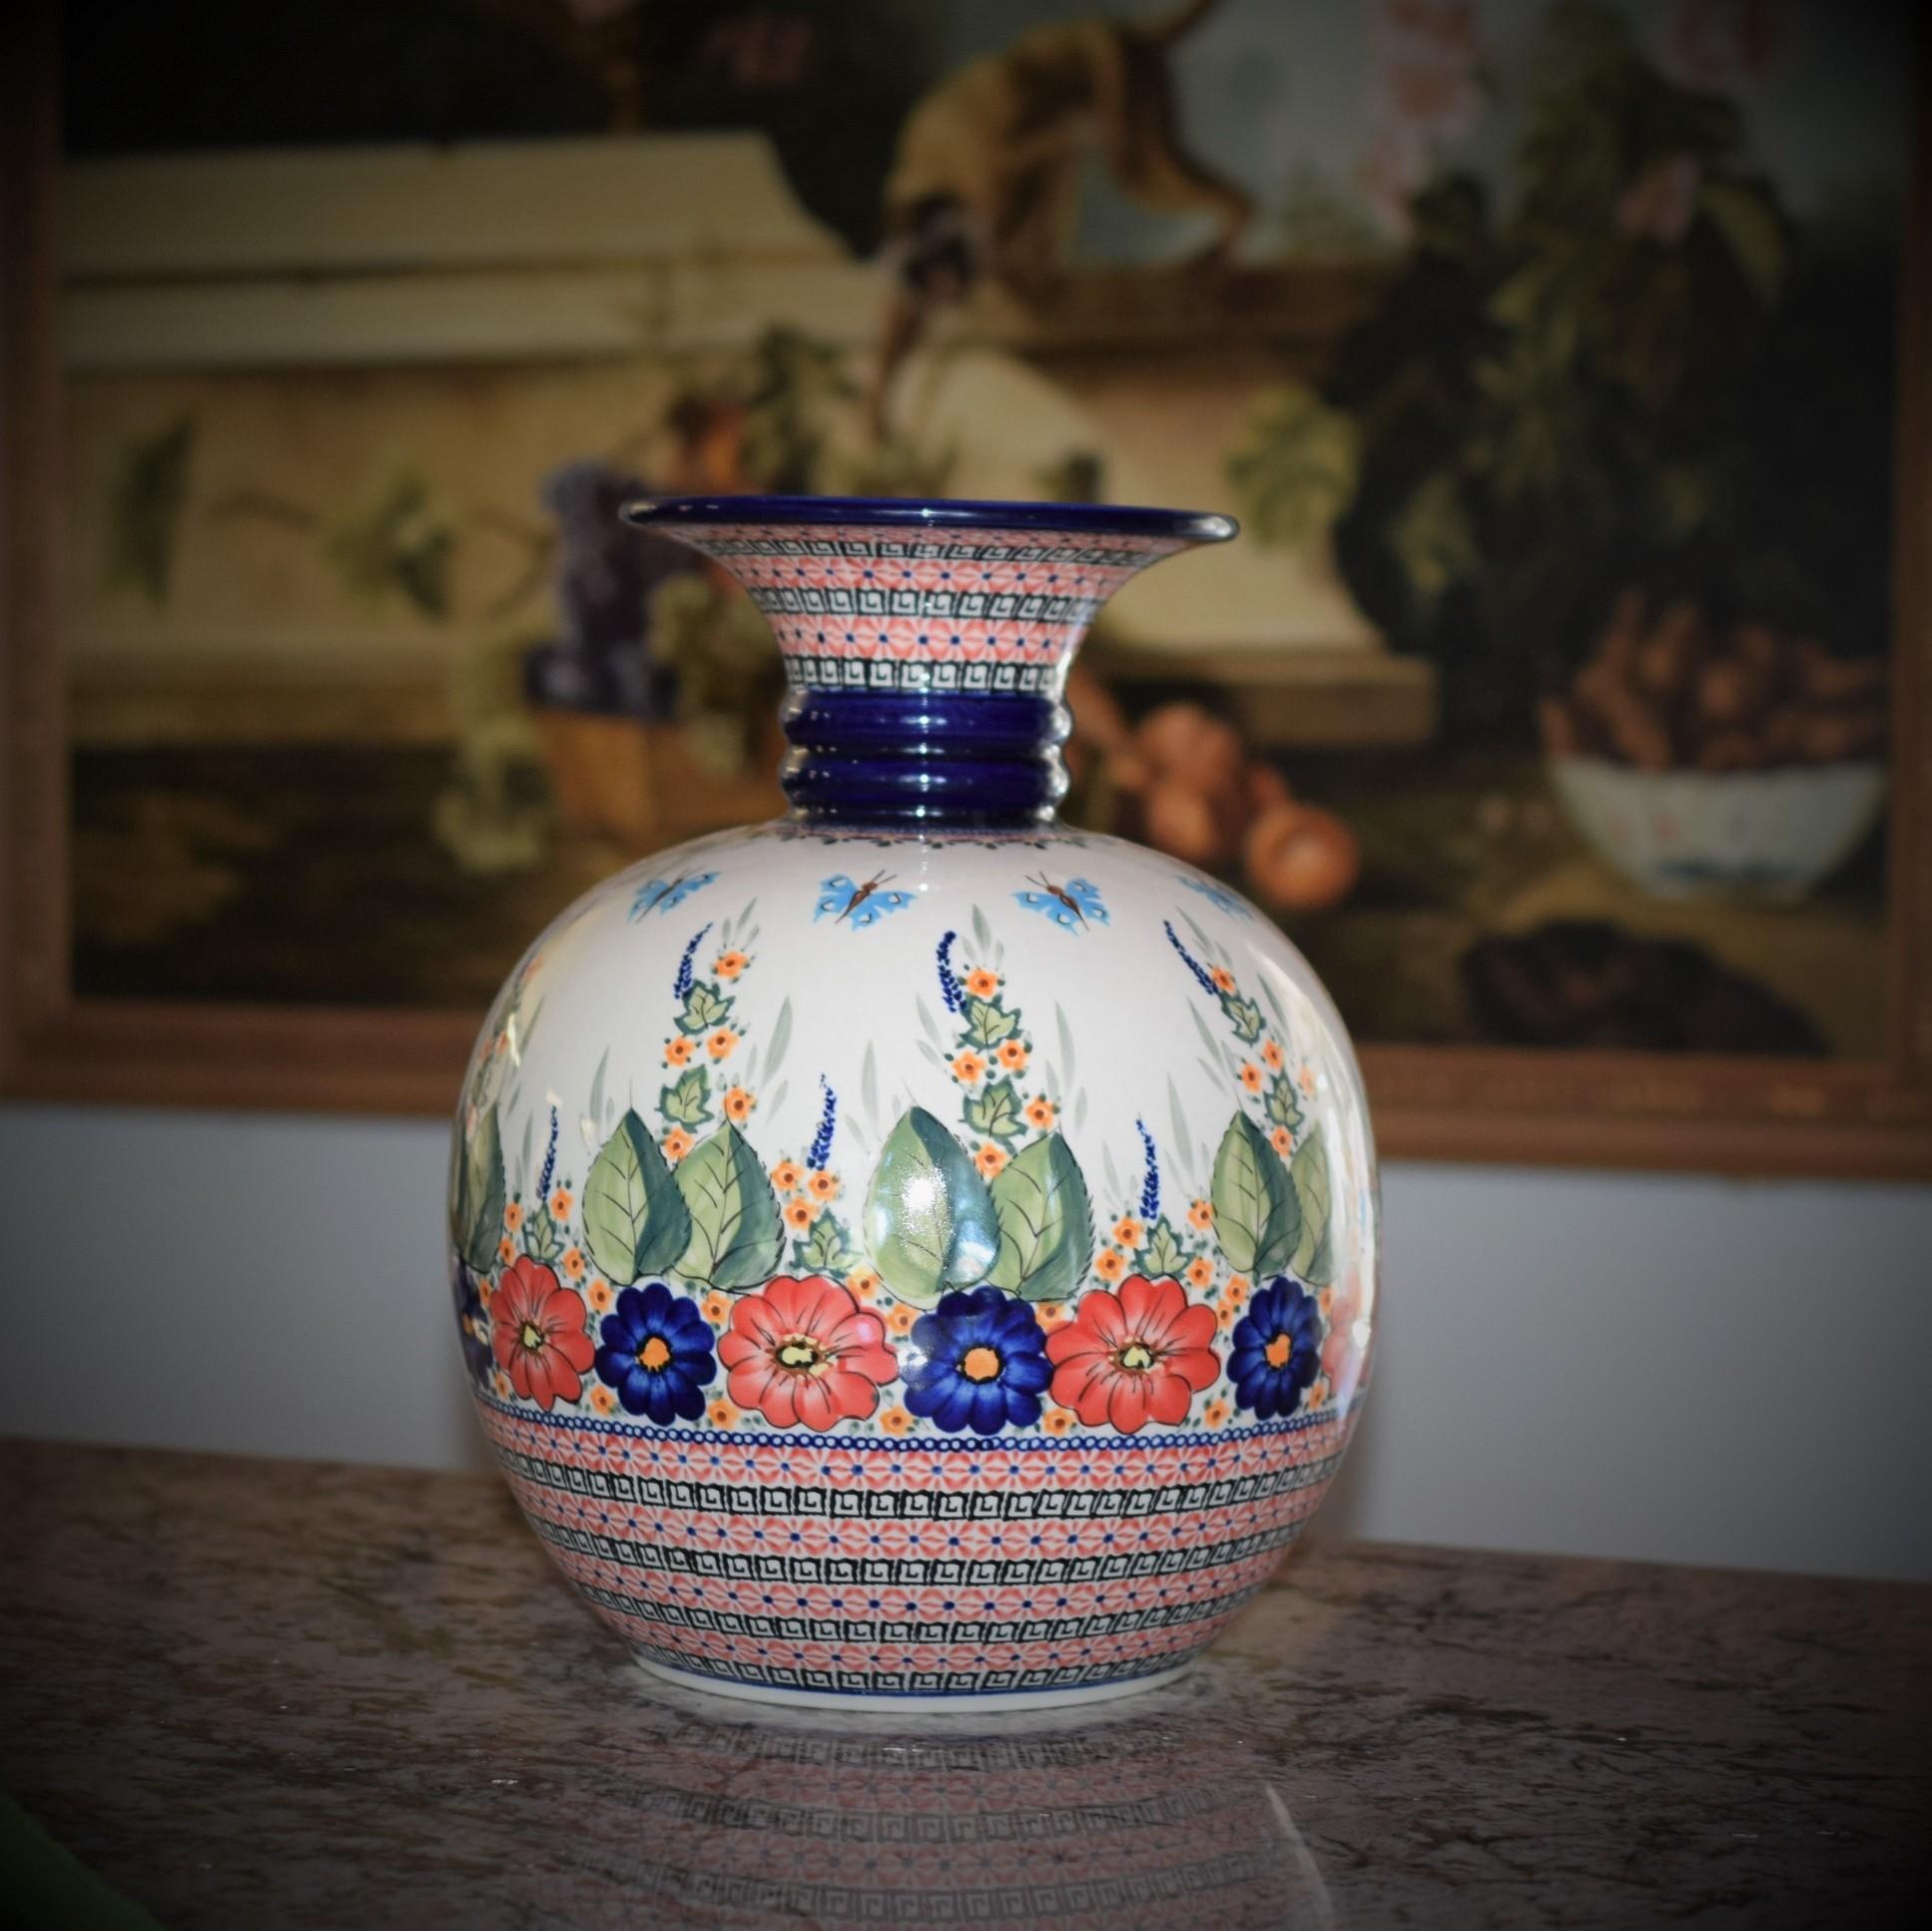 EX LG Vase Butterfly